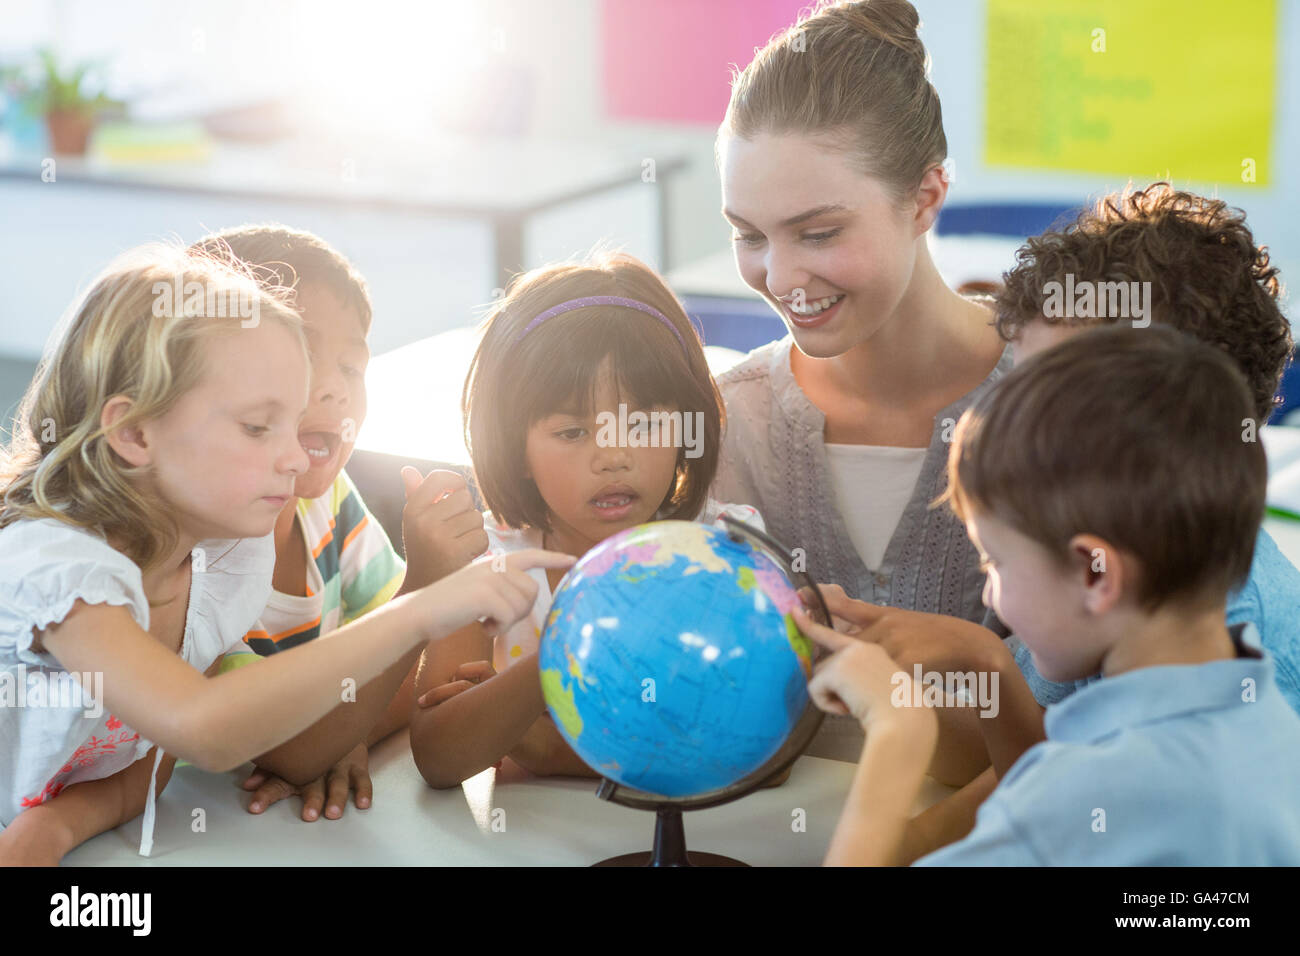 Teacher looking at schoolchildren touching globe - Stock Image